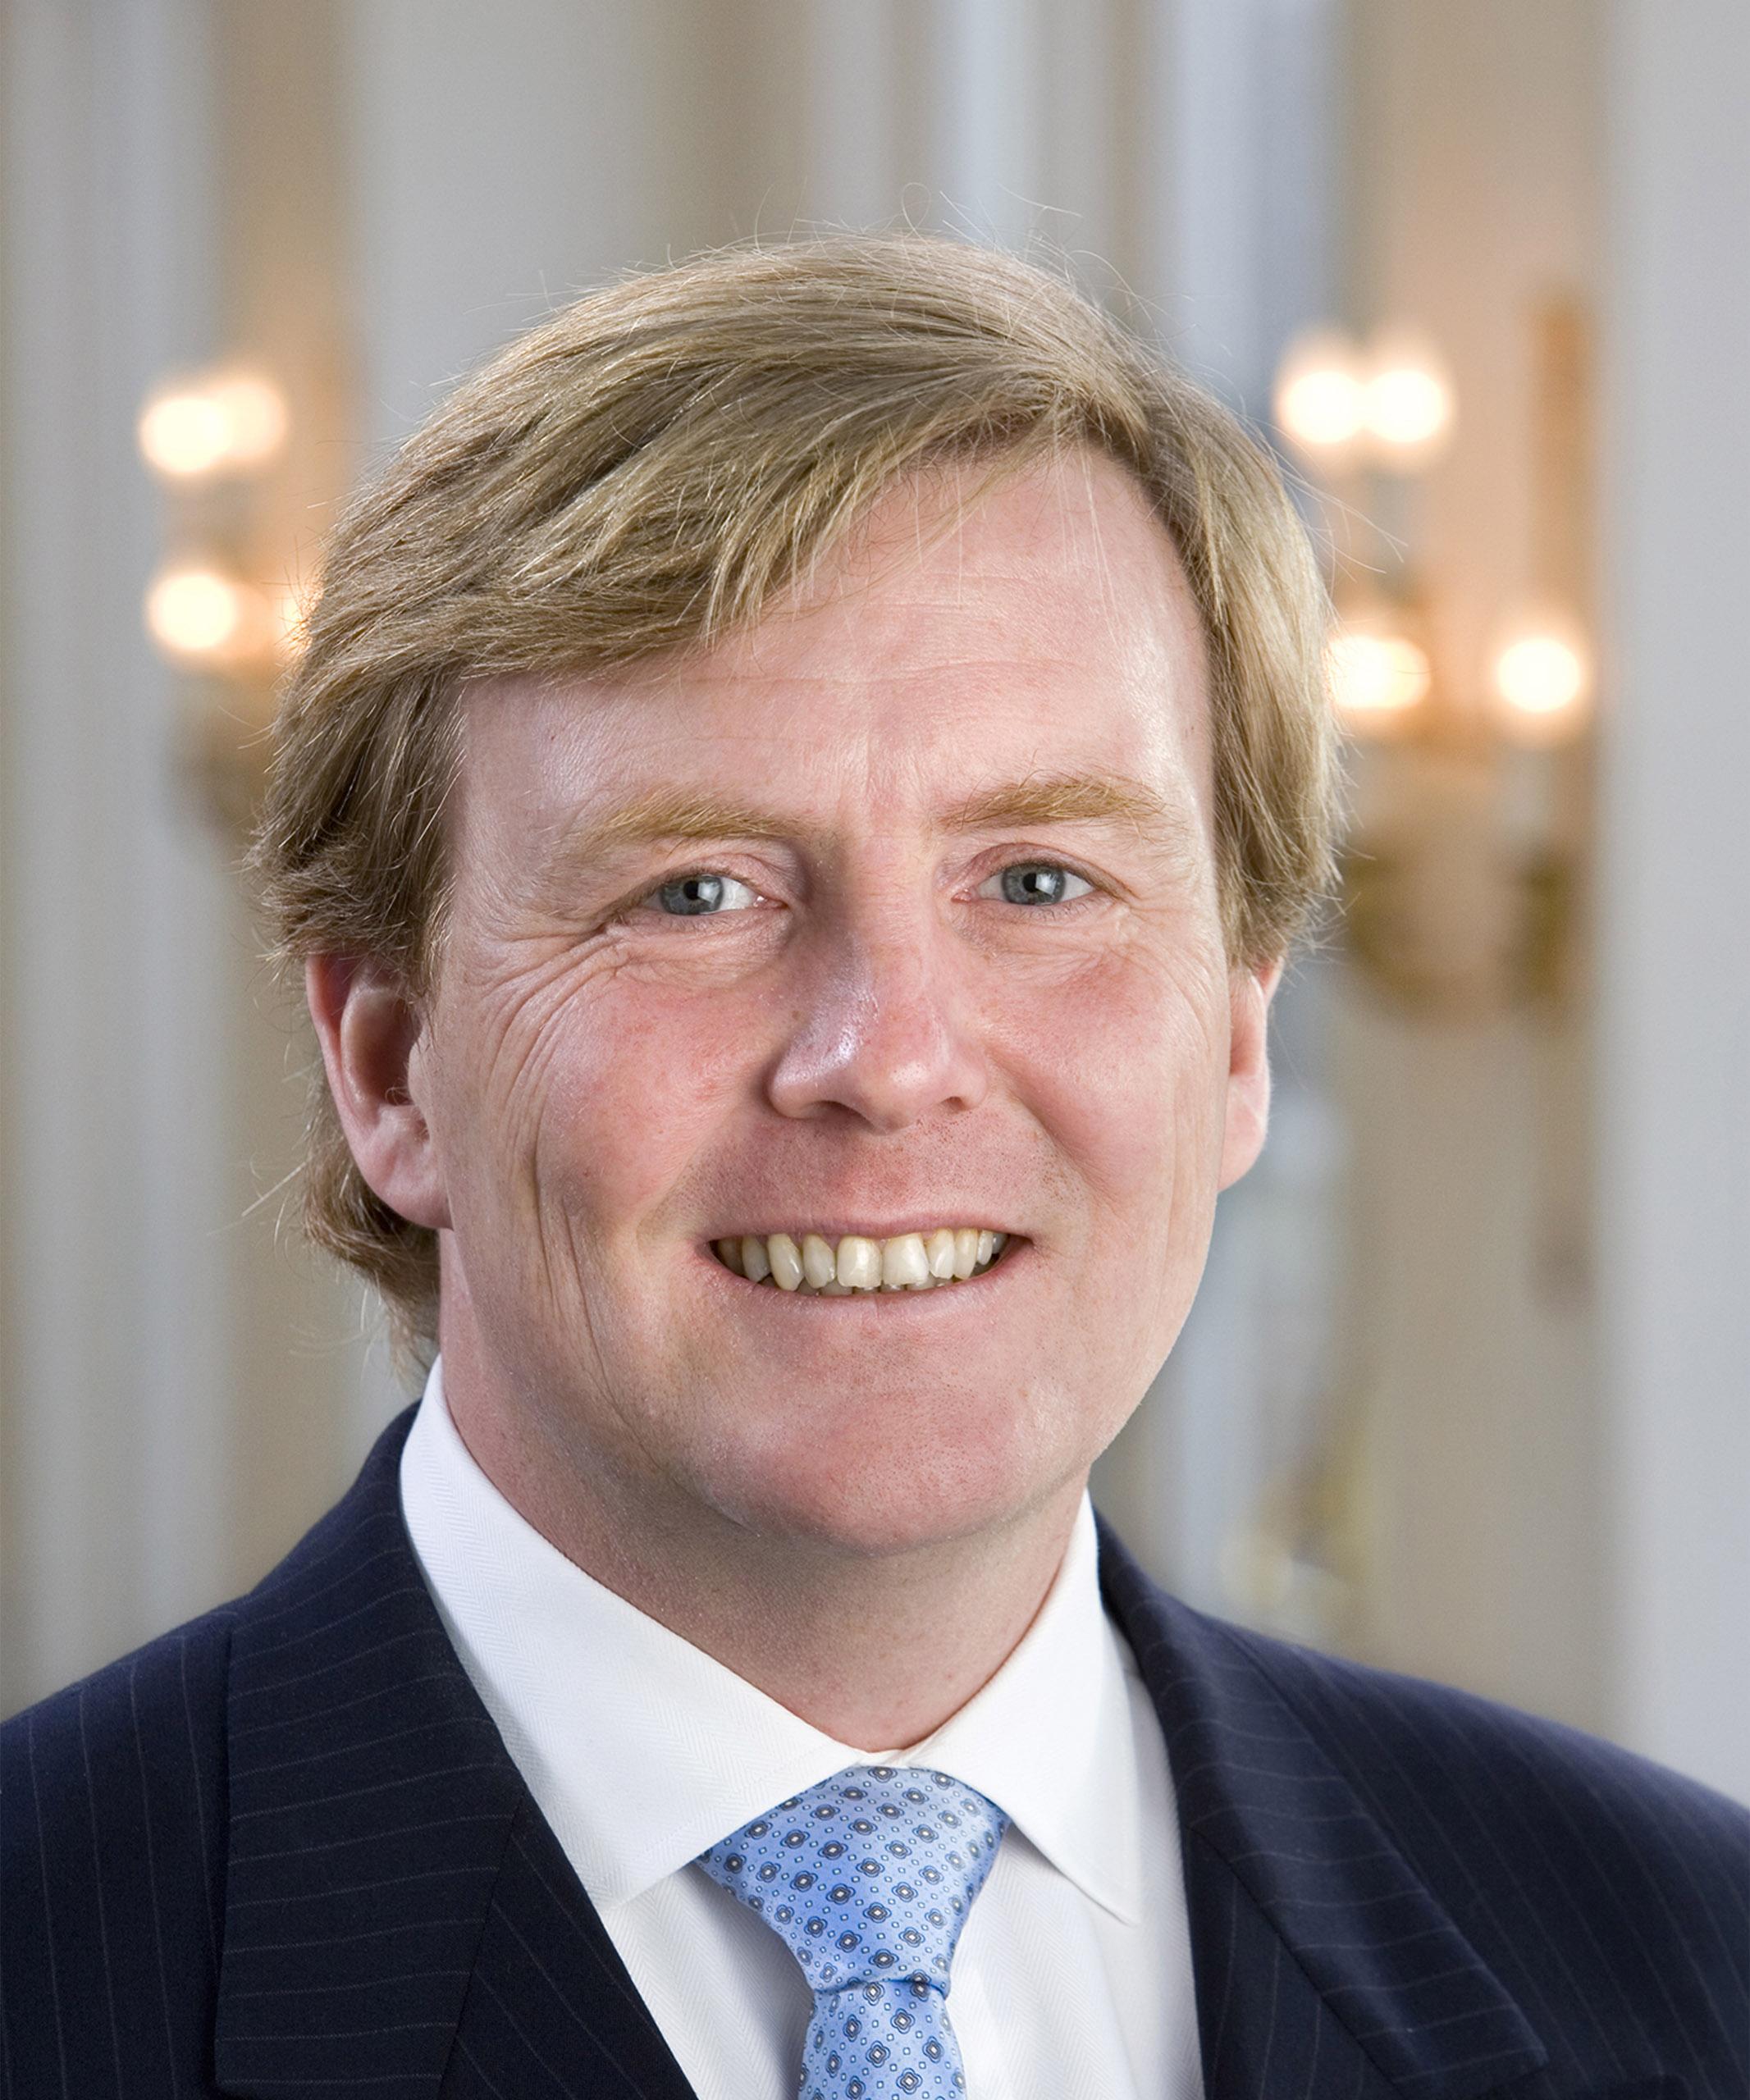 Before-Koning Willem Alexander